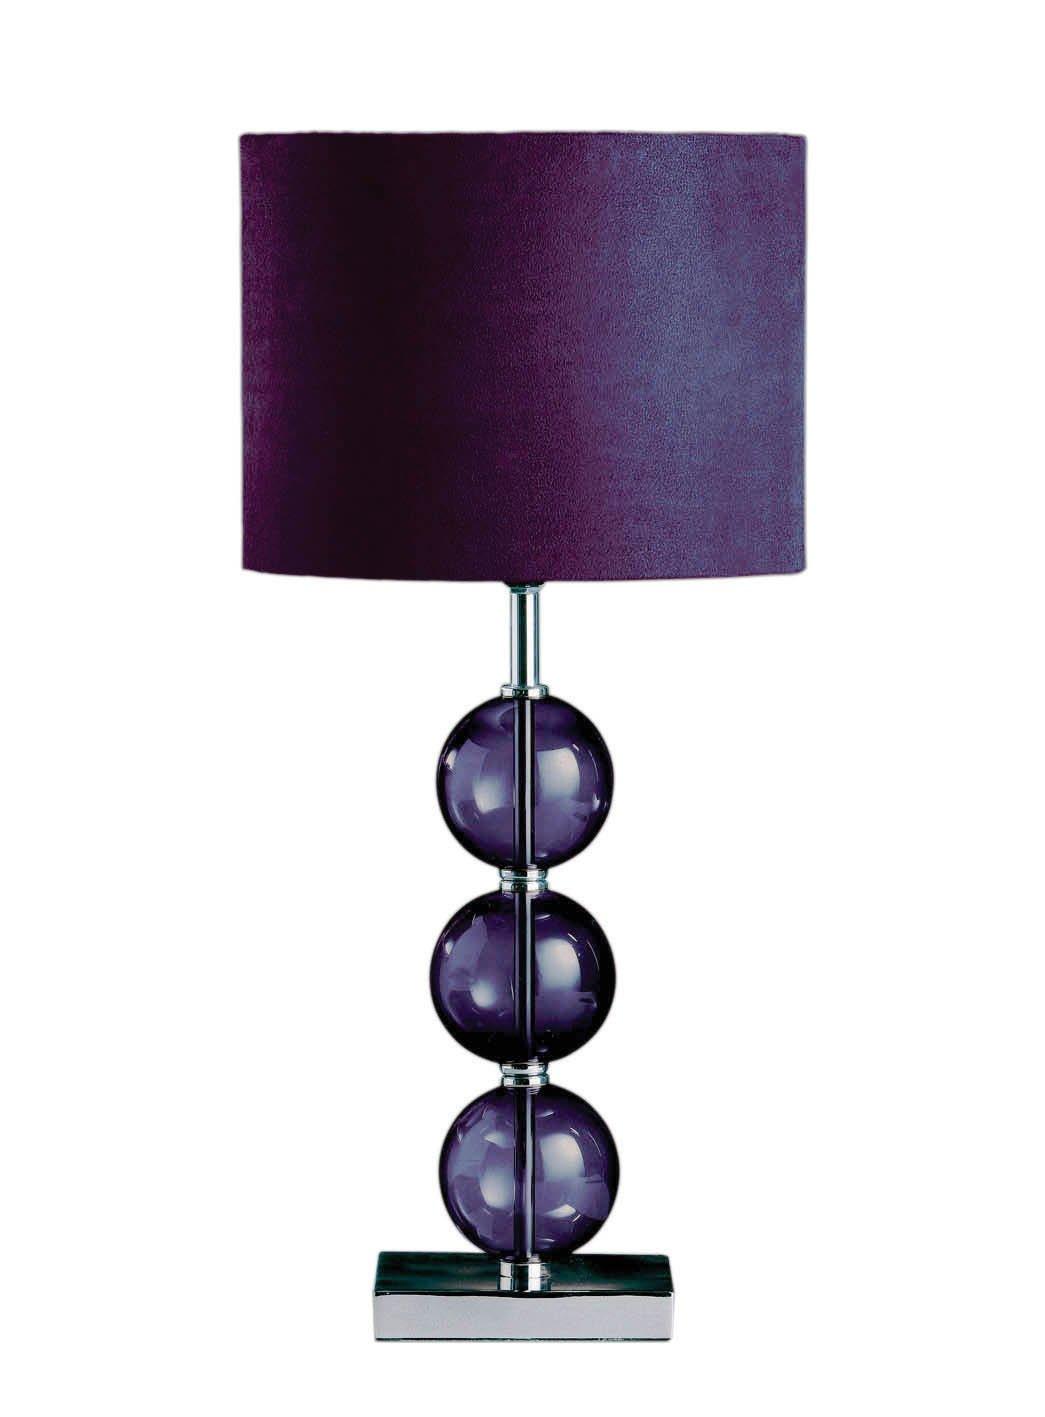 Premier housewares mistro purple table lamp with 3 glass balls premier housewares mistro purple table lamp with 3 glass balls chrome base and faux suede shade amazon lighting geotapseo Gallery